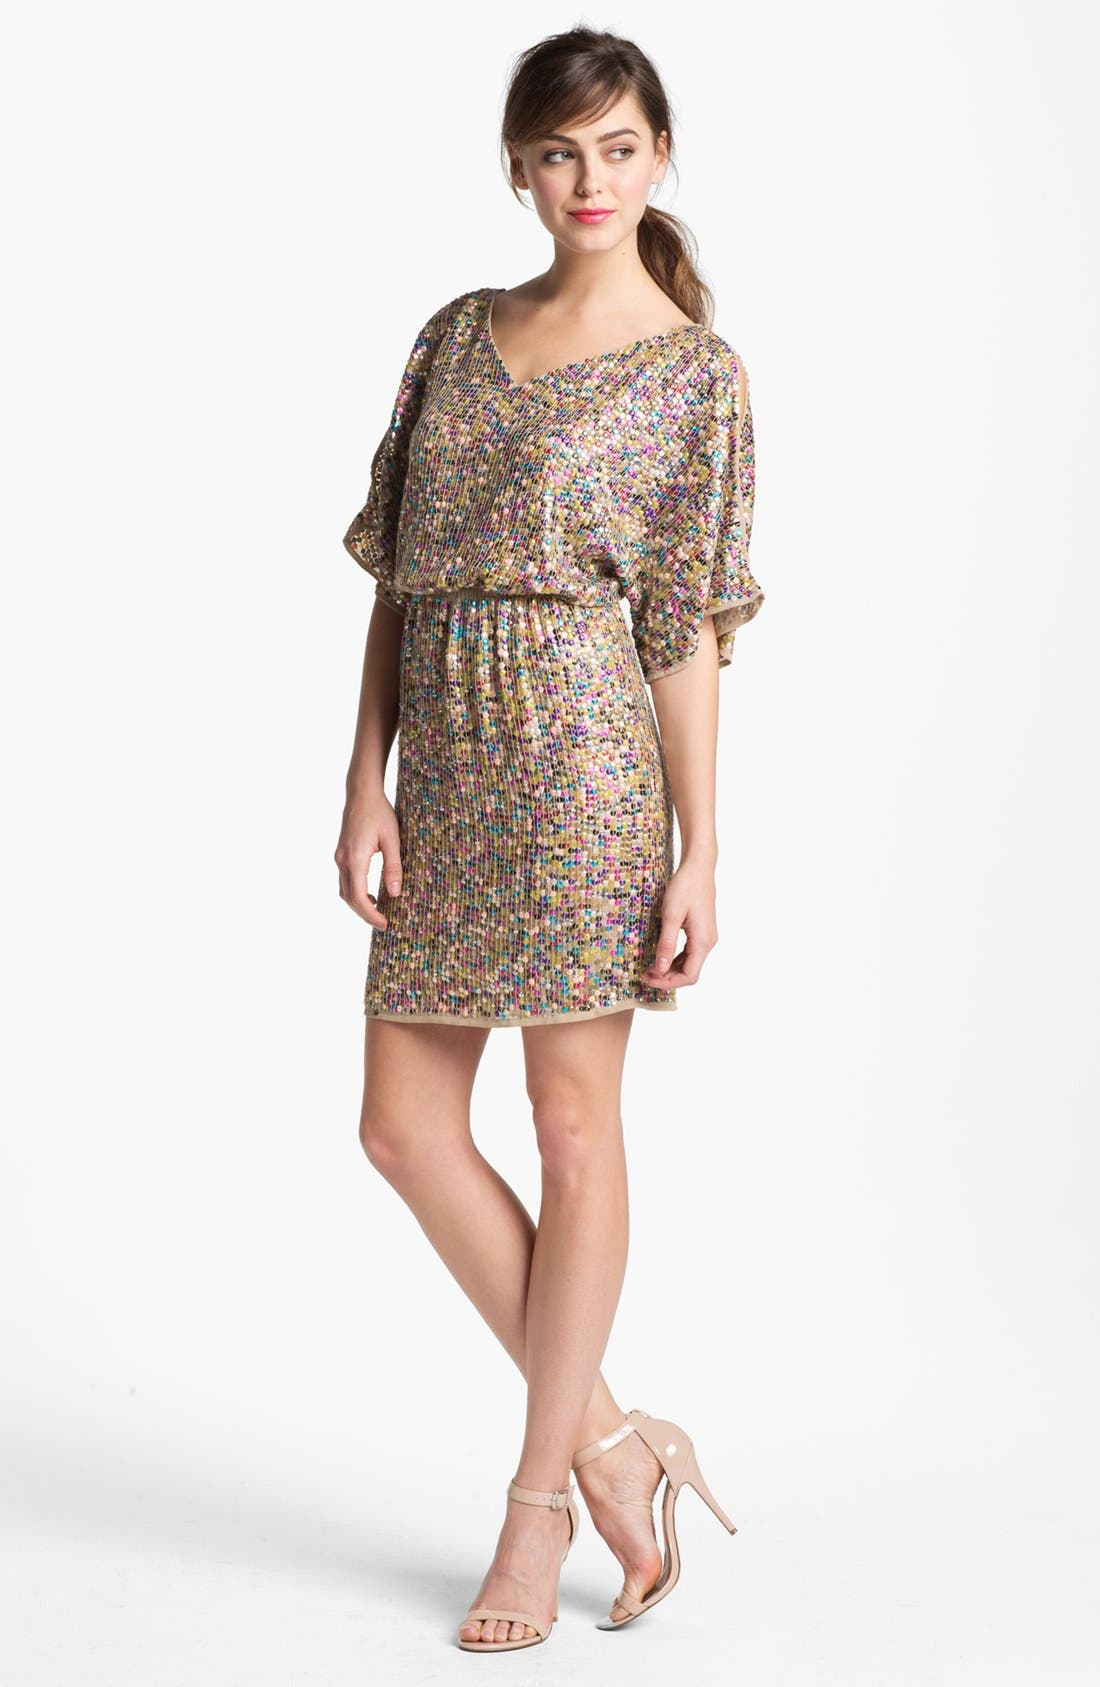 Alternate Image 1 Selected - Trina Turk 'Vega' Blouson Sequin Dress